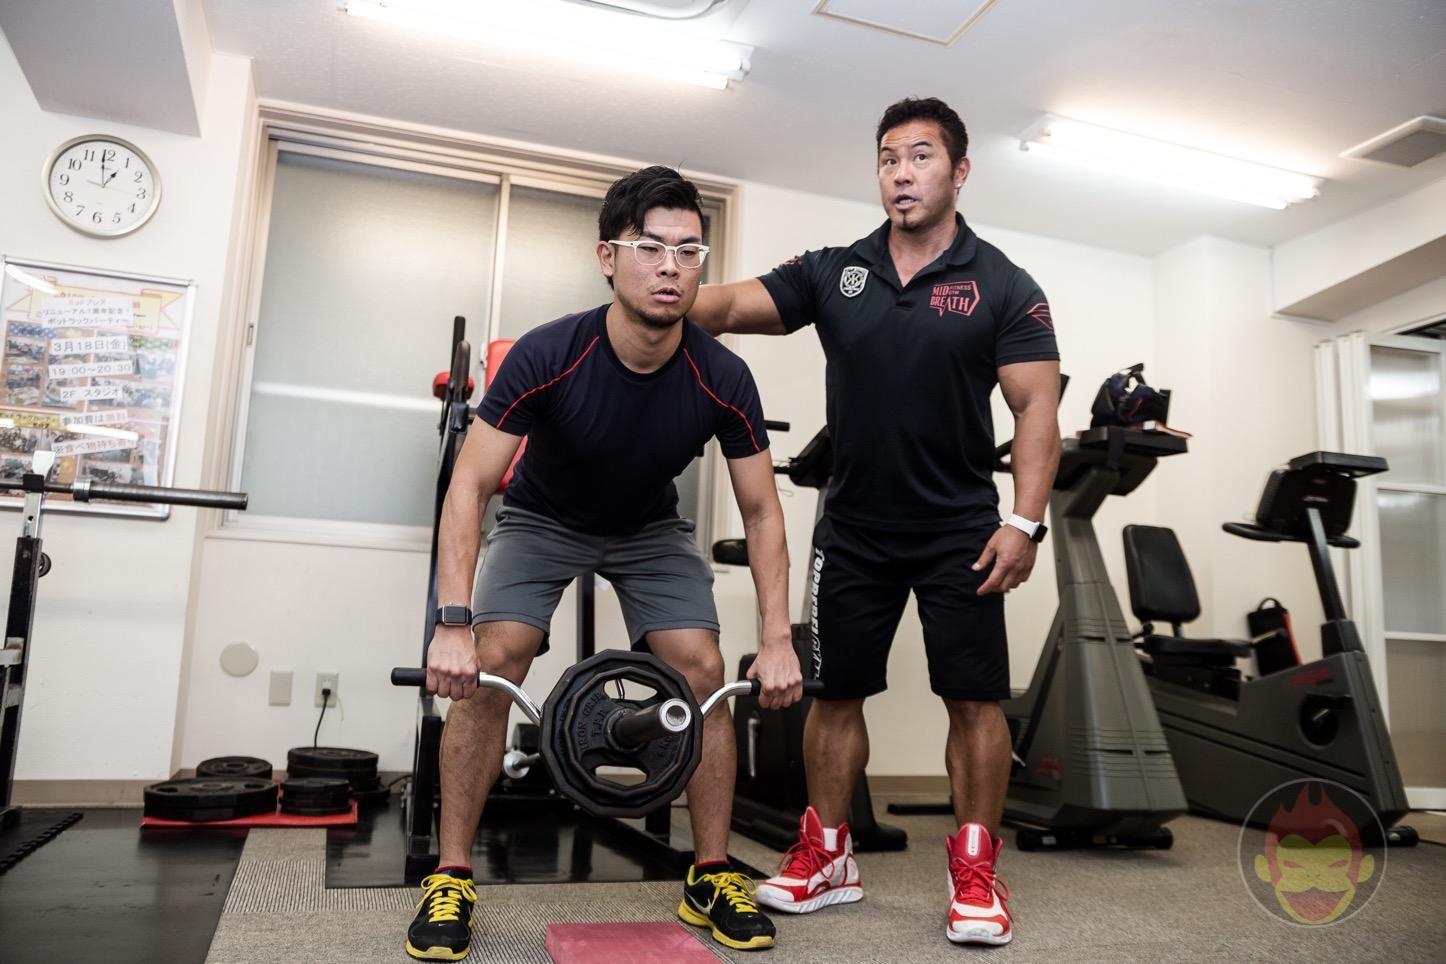 Gori-Workout-At-Midpress-Gym-85.jpg